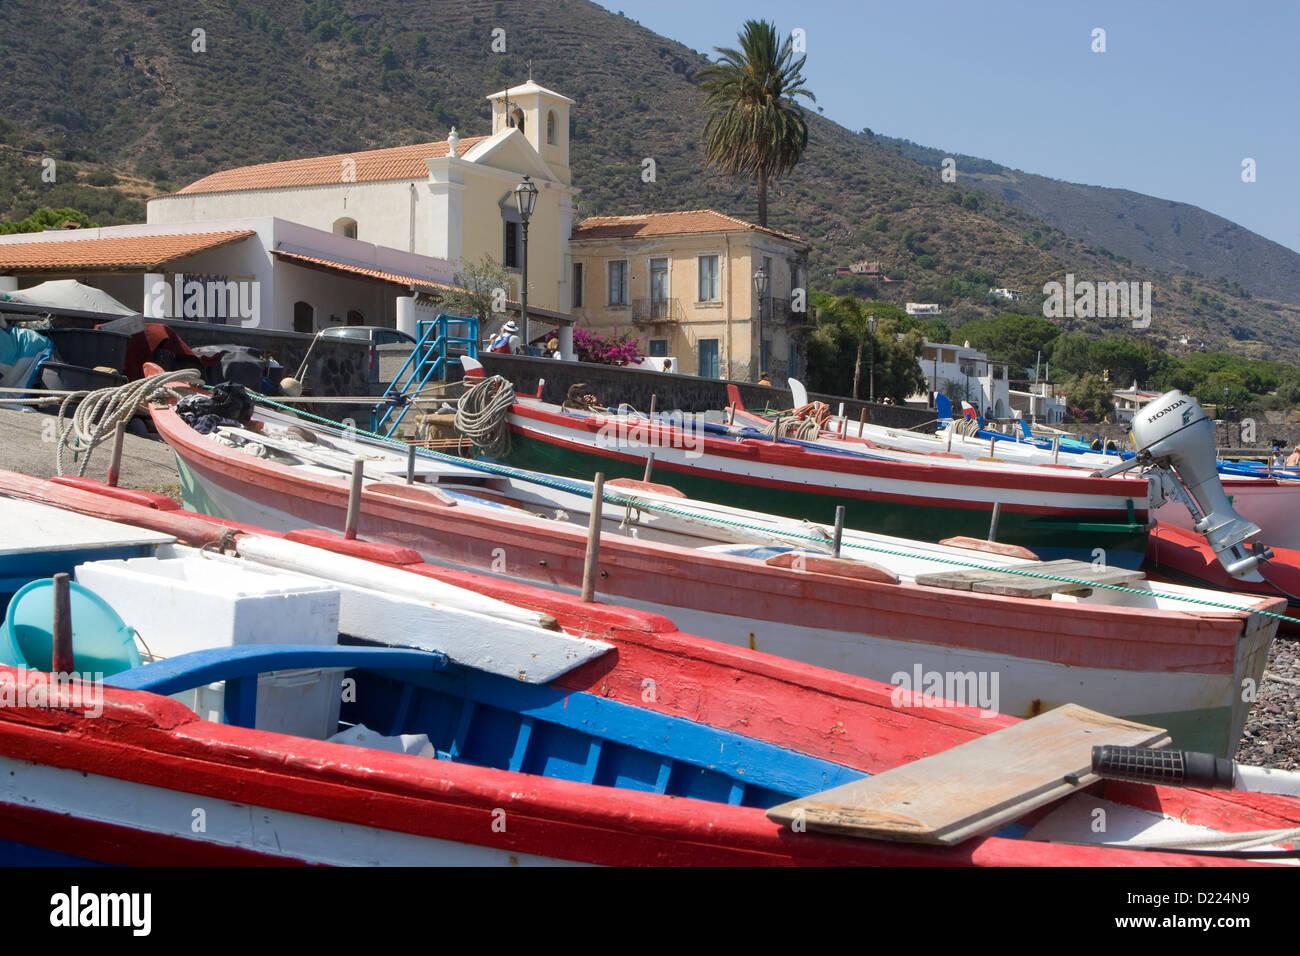 The Aeolian Islands: Salina - Lingua beach & fishing boats - Stock Image